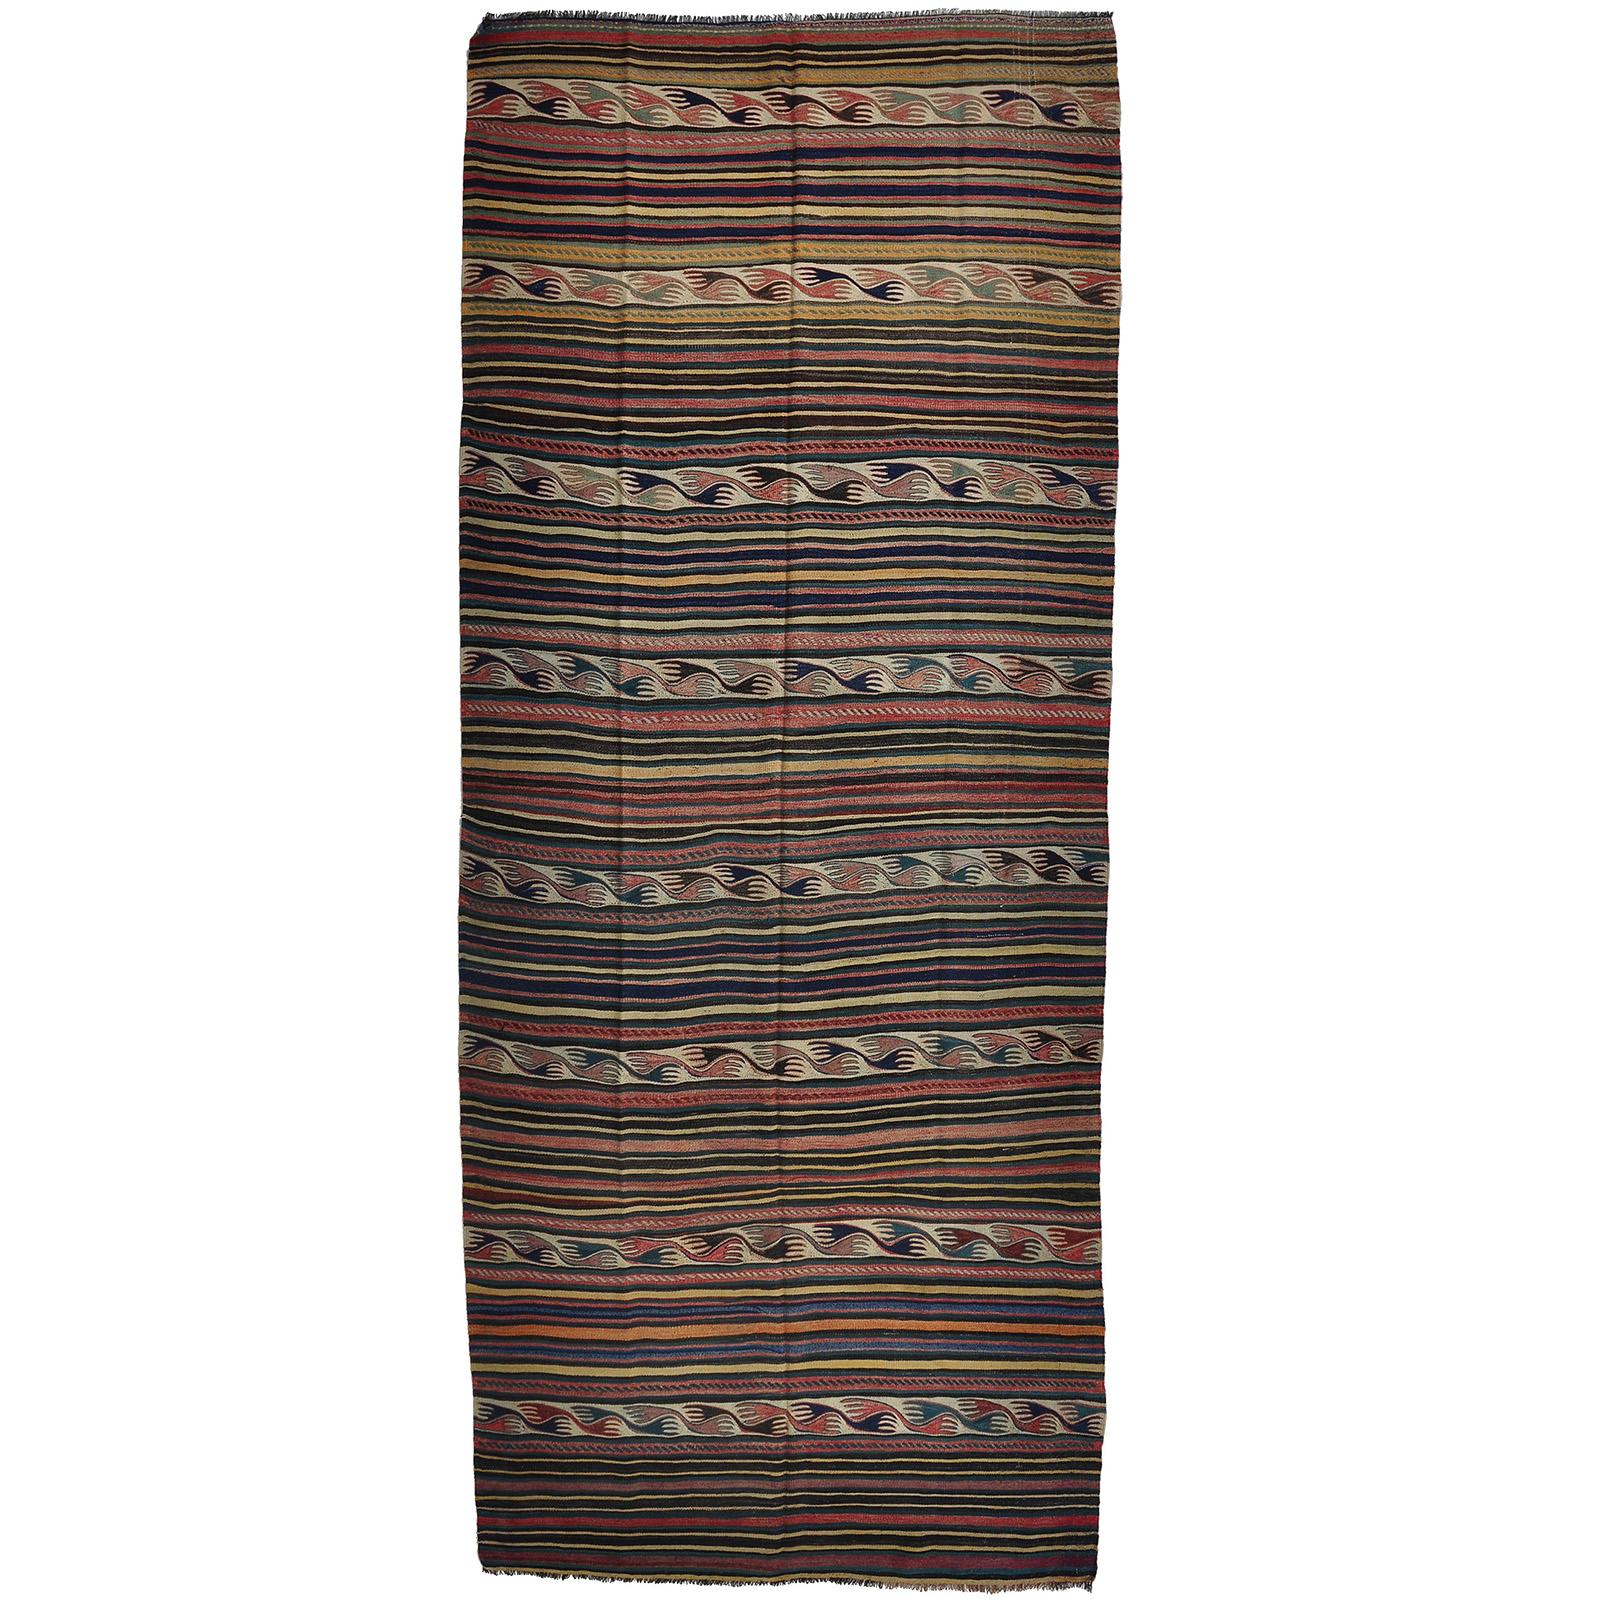 Kelim (old) matta storlek 384x160 cm